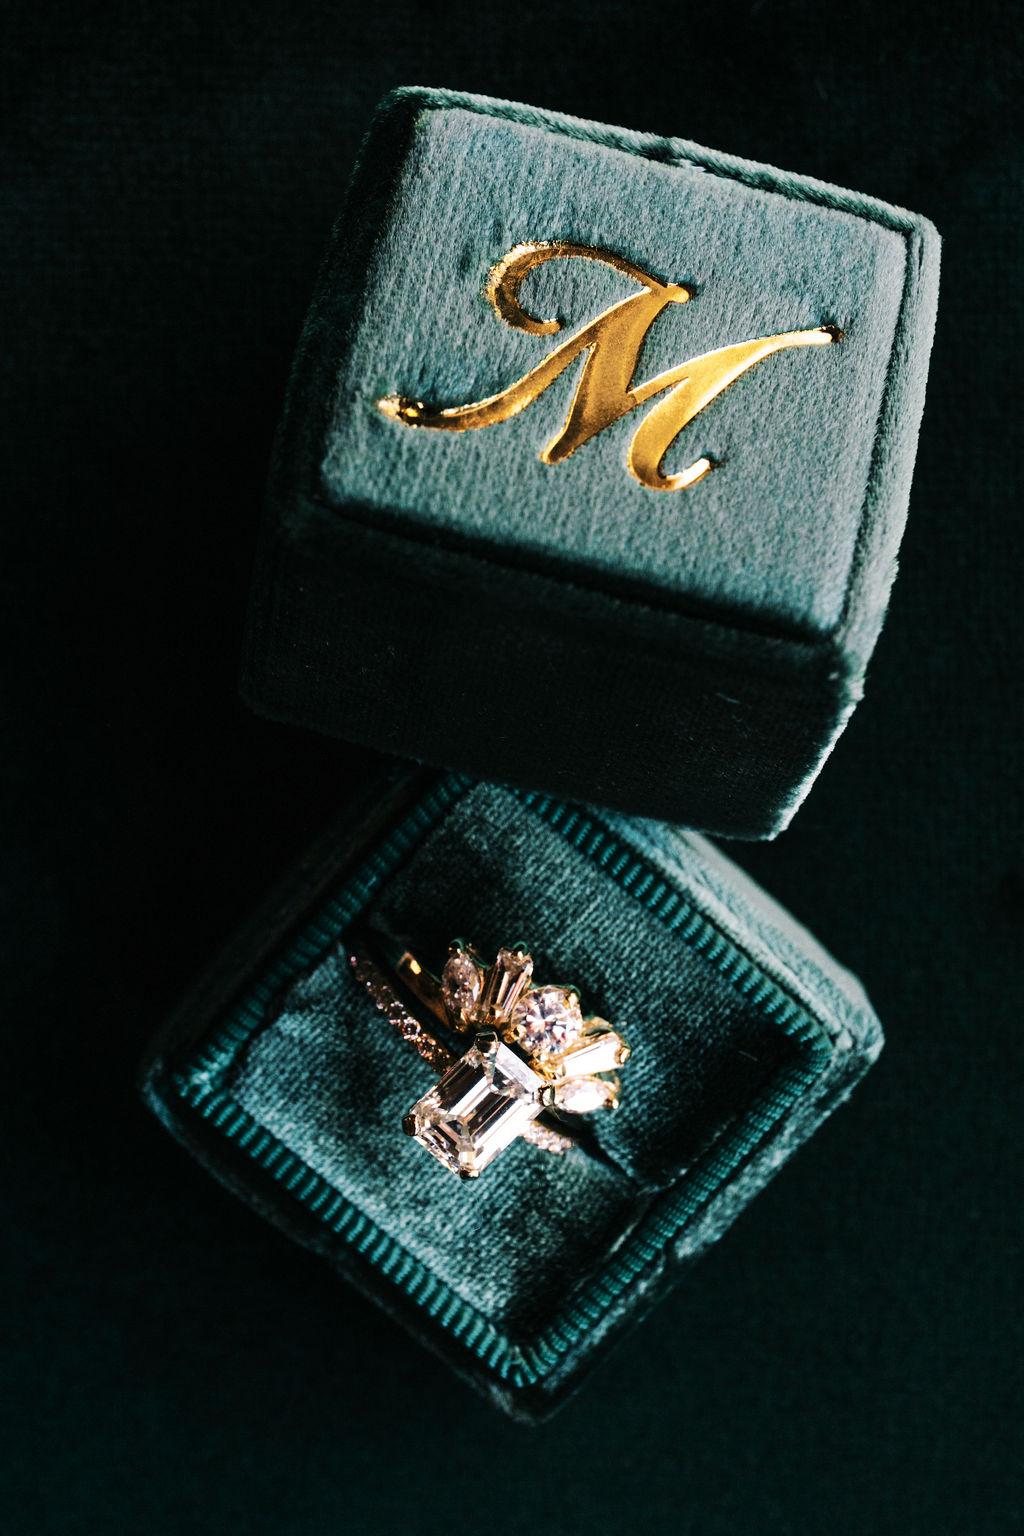 meagan robert wedding ring in green velvet box